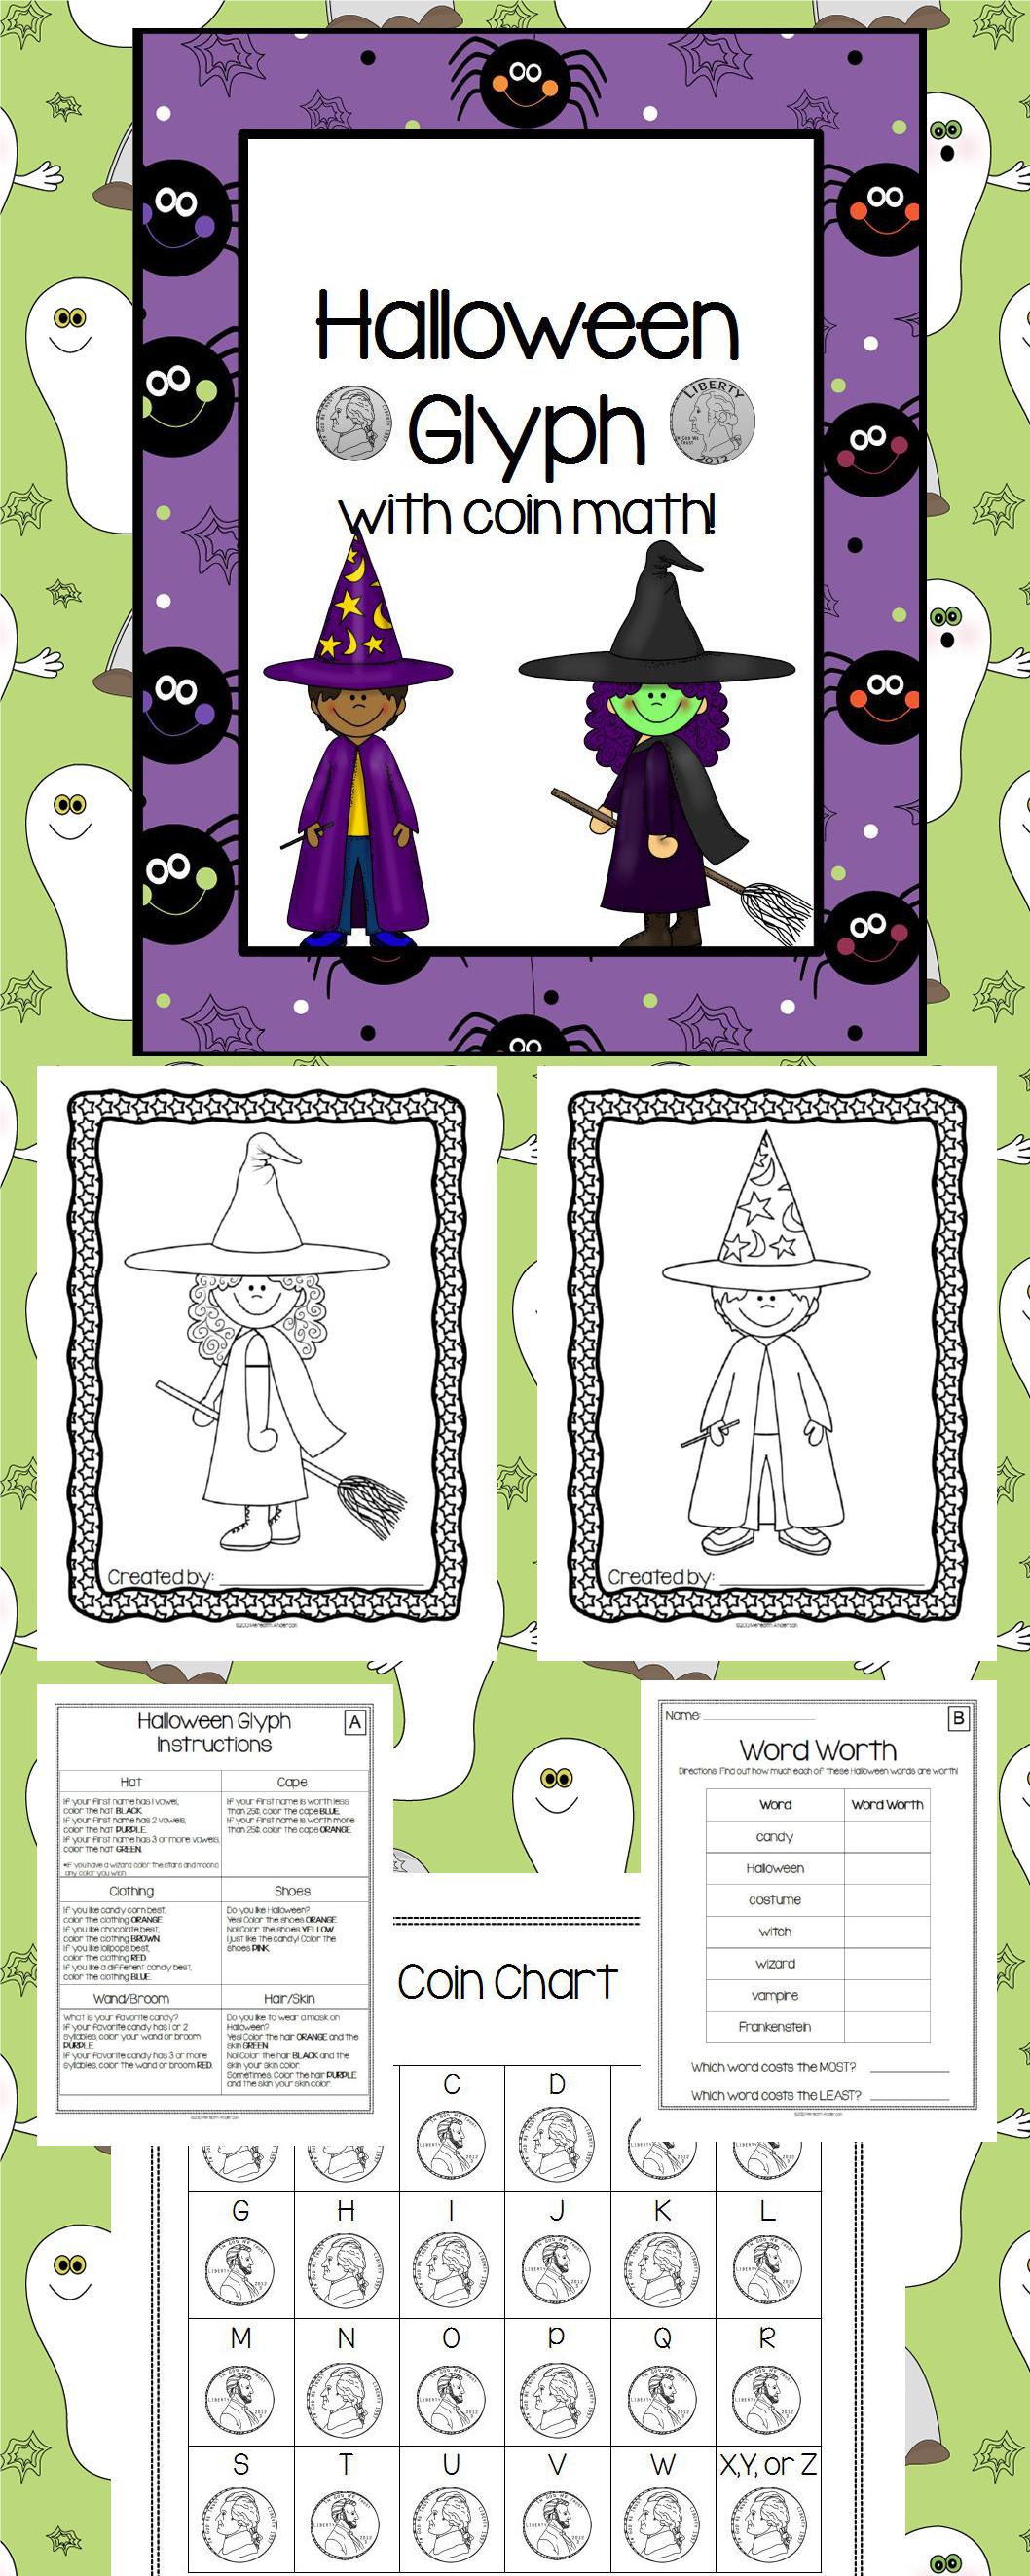 Asombroso Hoja De Matemáticas De Halloween Galería - Dibujos Para ...